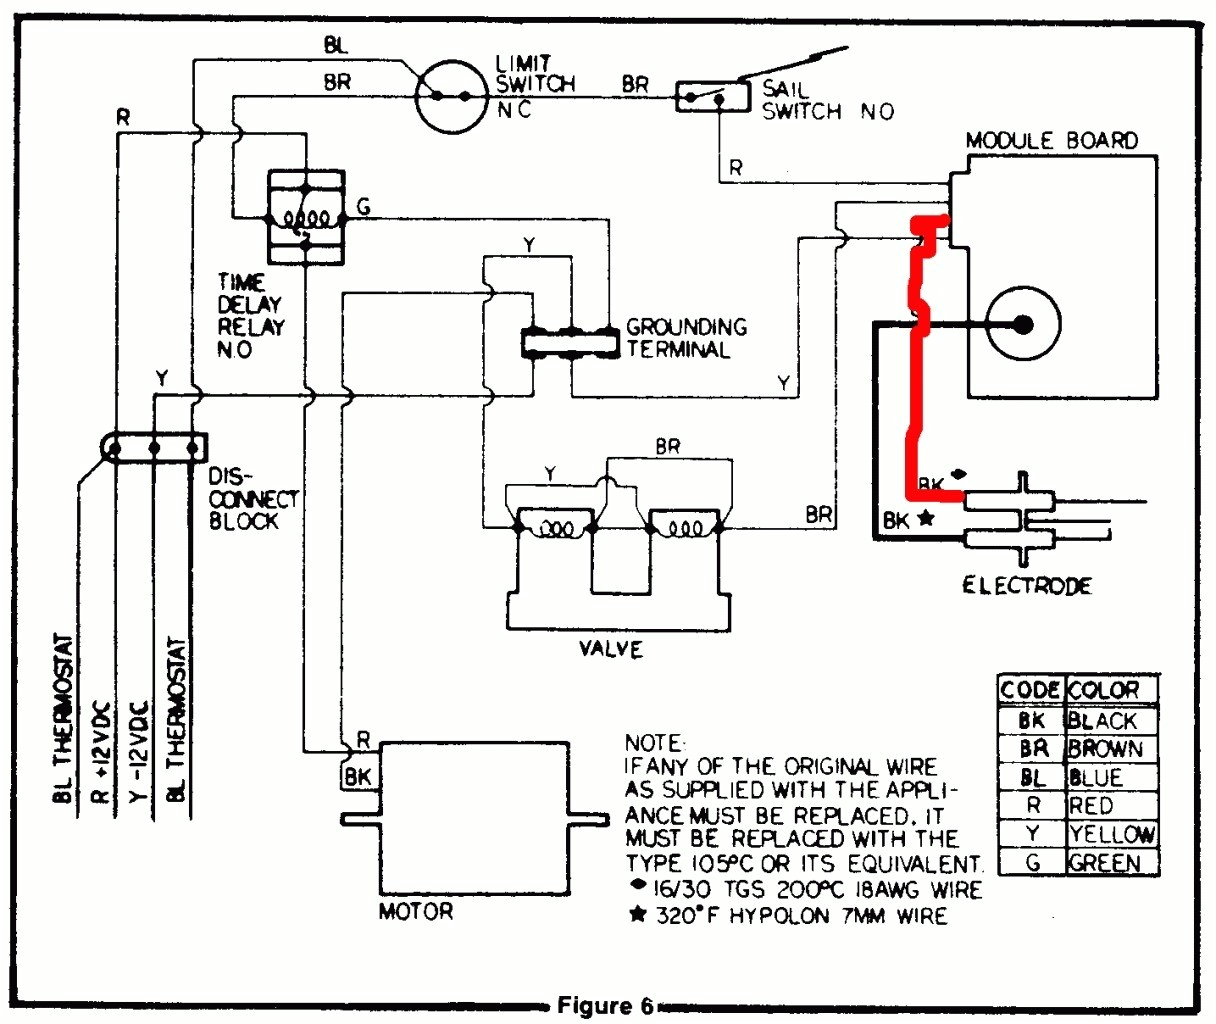 rv furnace wiring diagram data diagram schematic rv furnace wiring diagram rv heater wiring